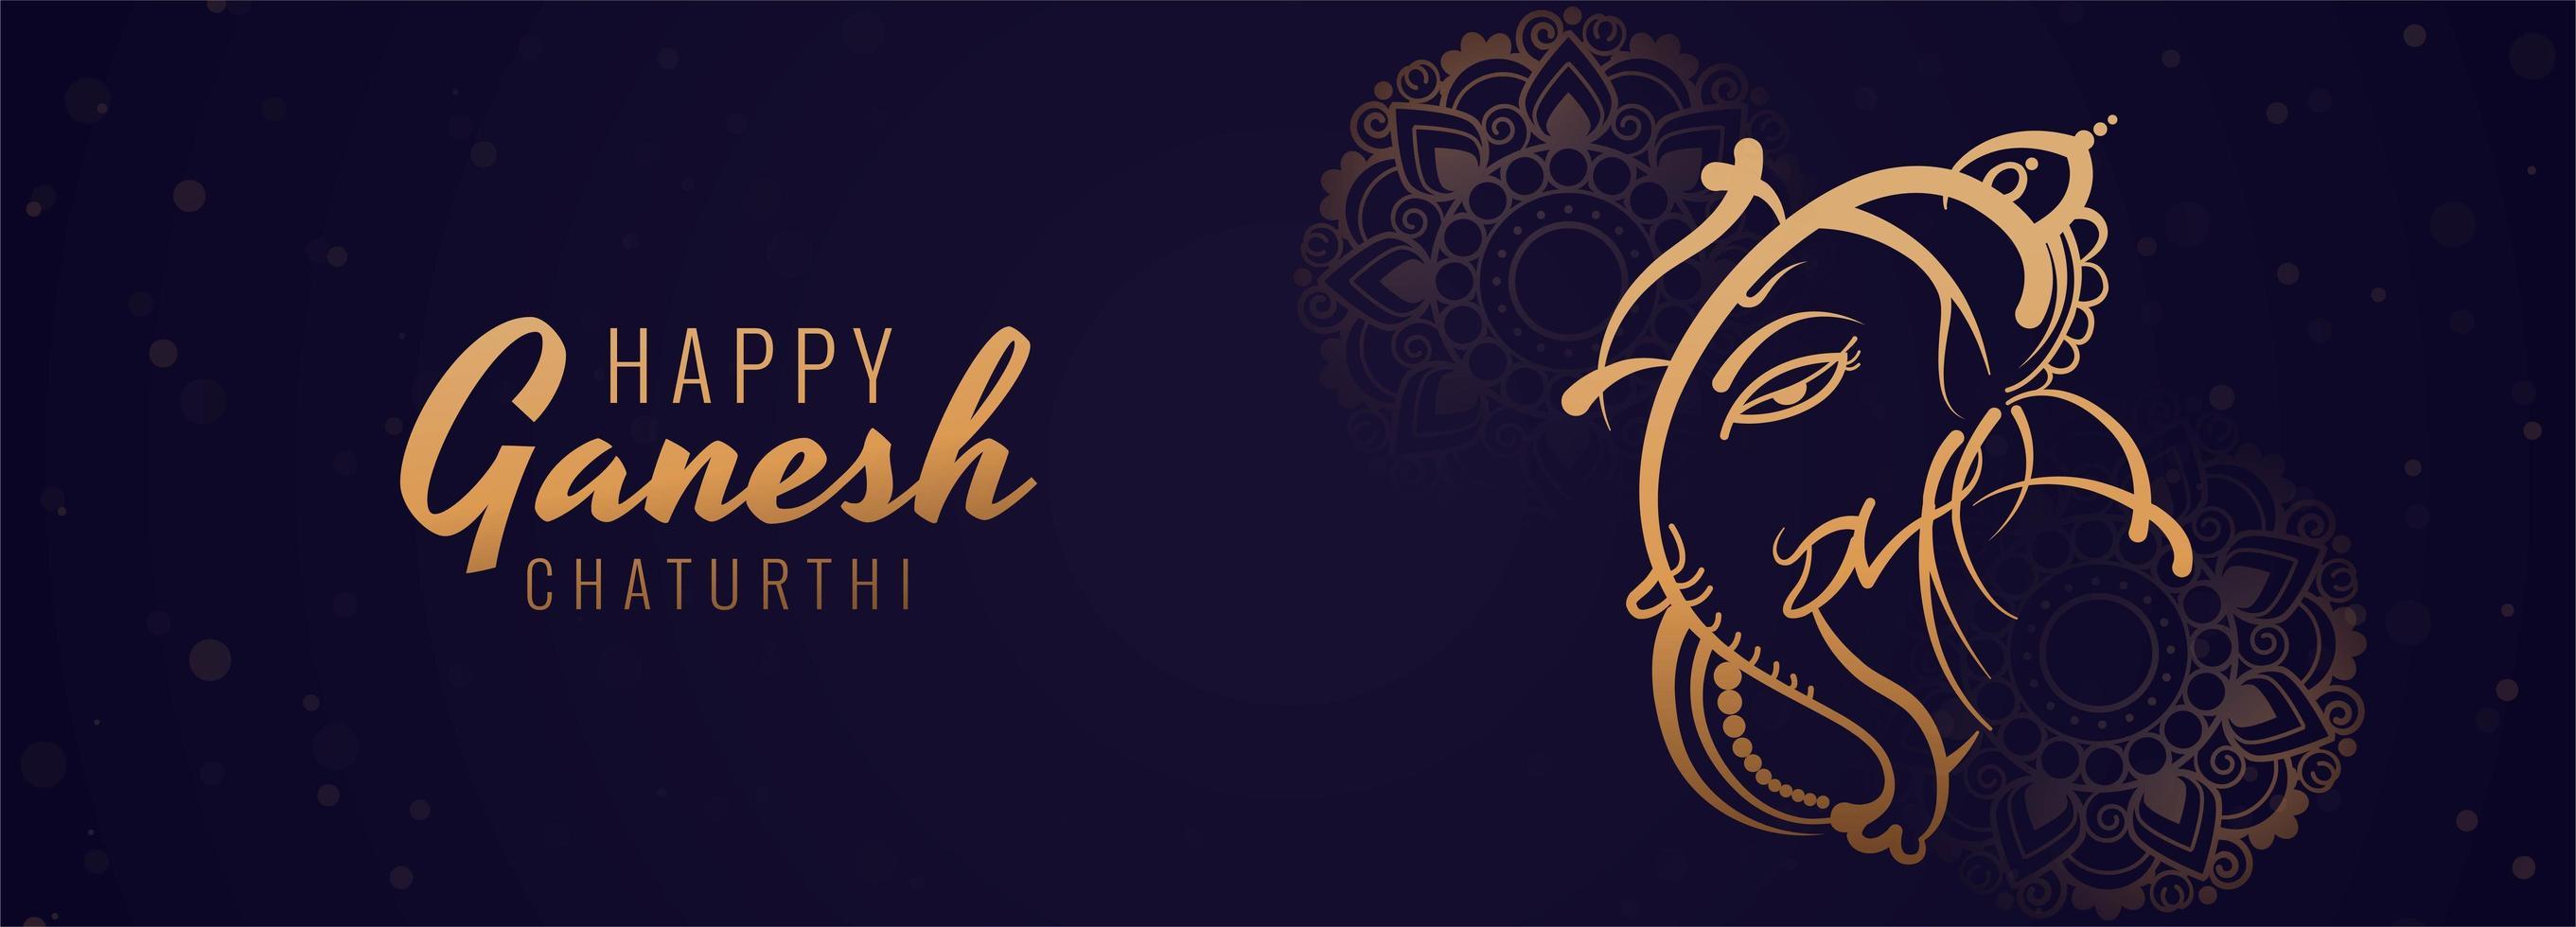 feliz festival de ganesh chaturthi banner azul horizontal vector